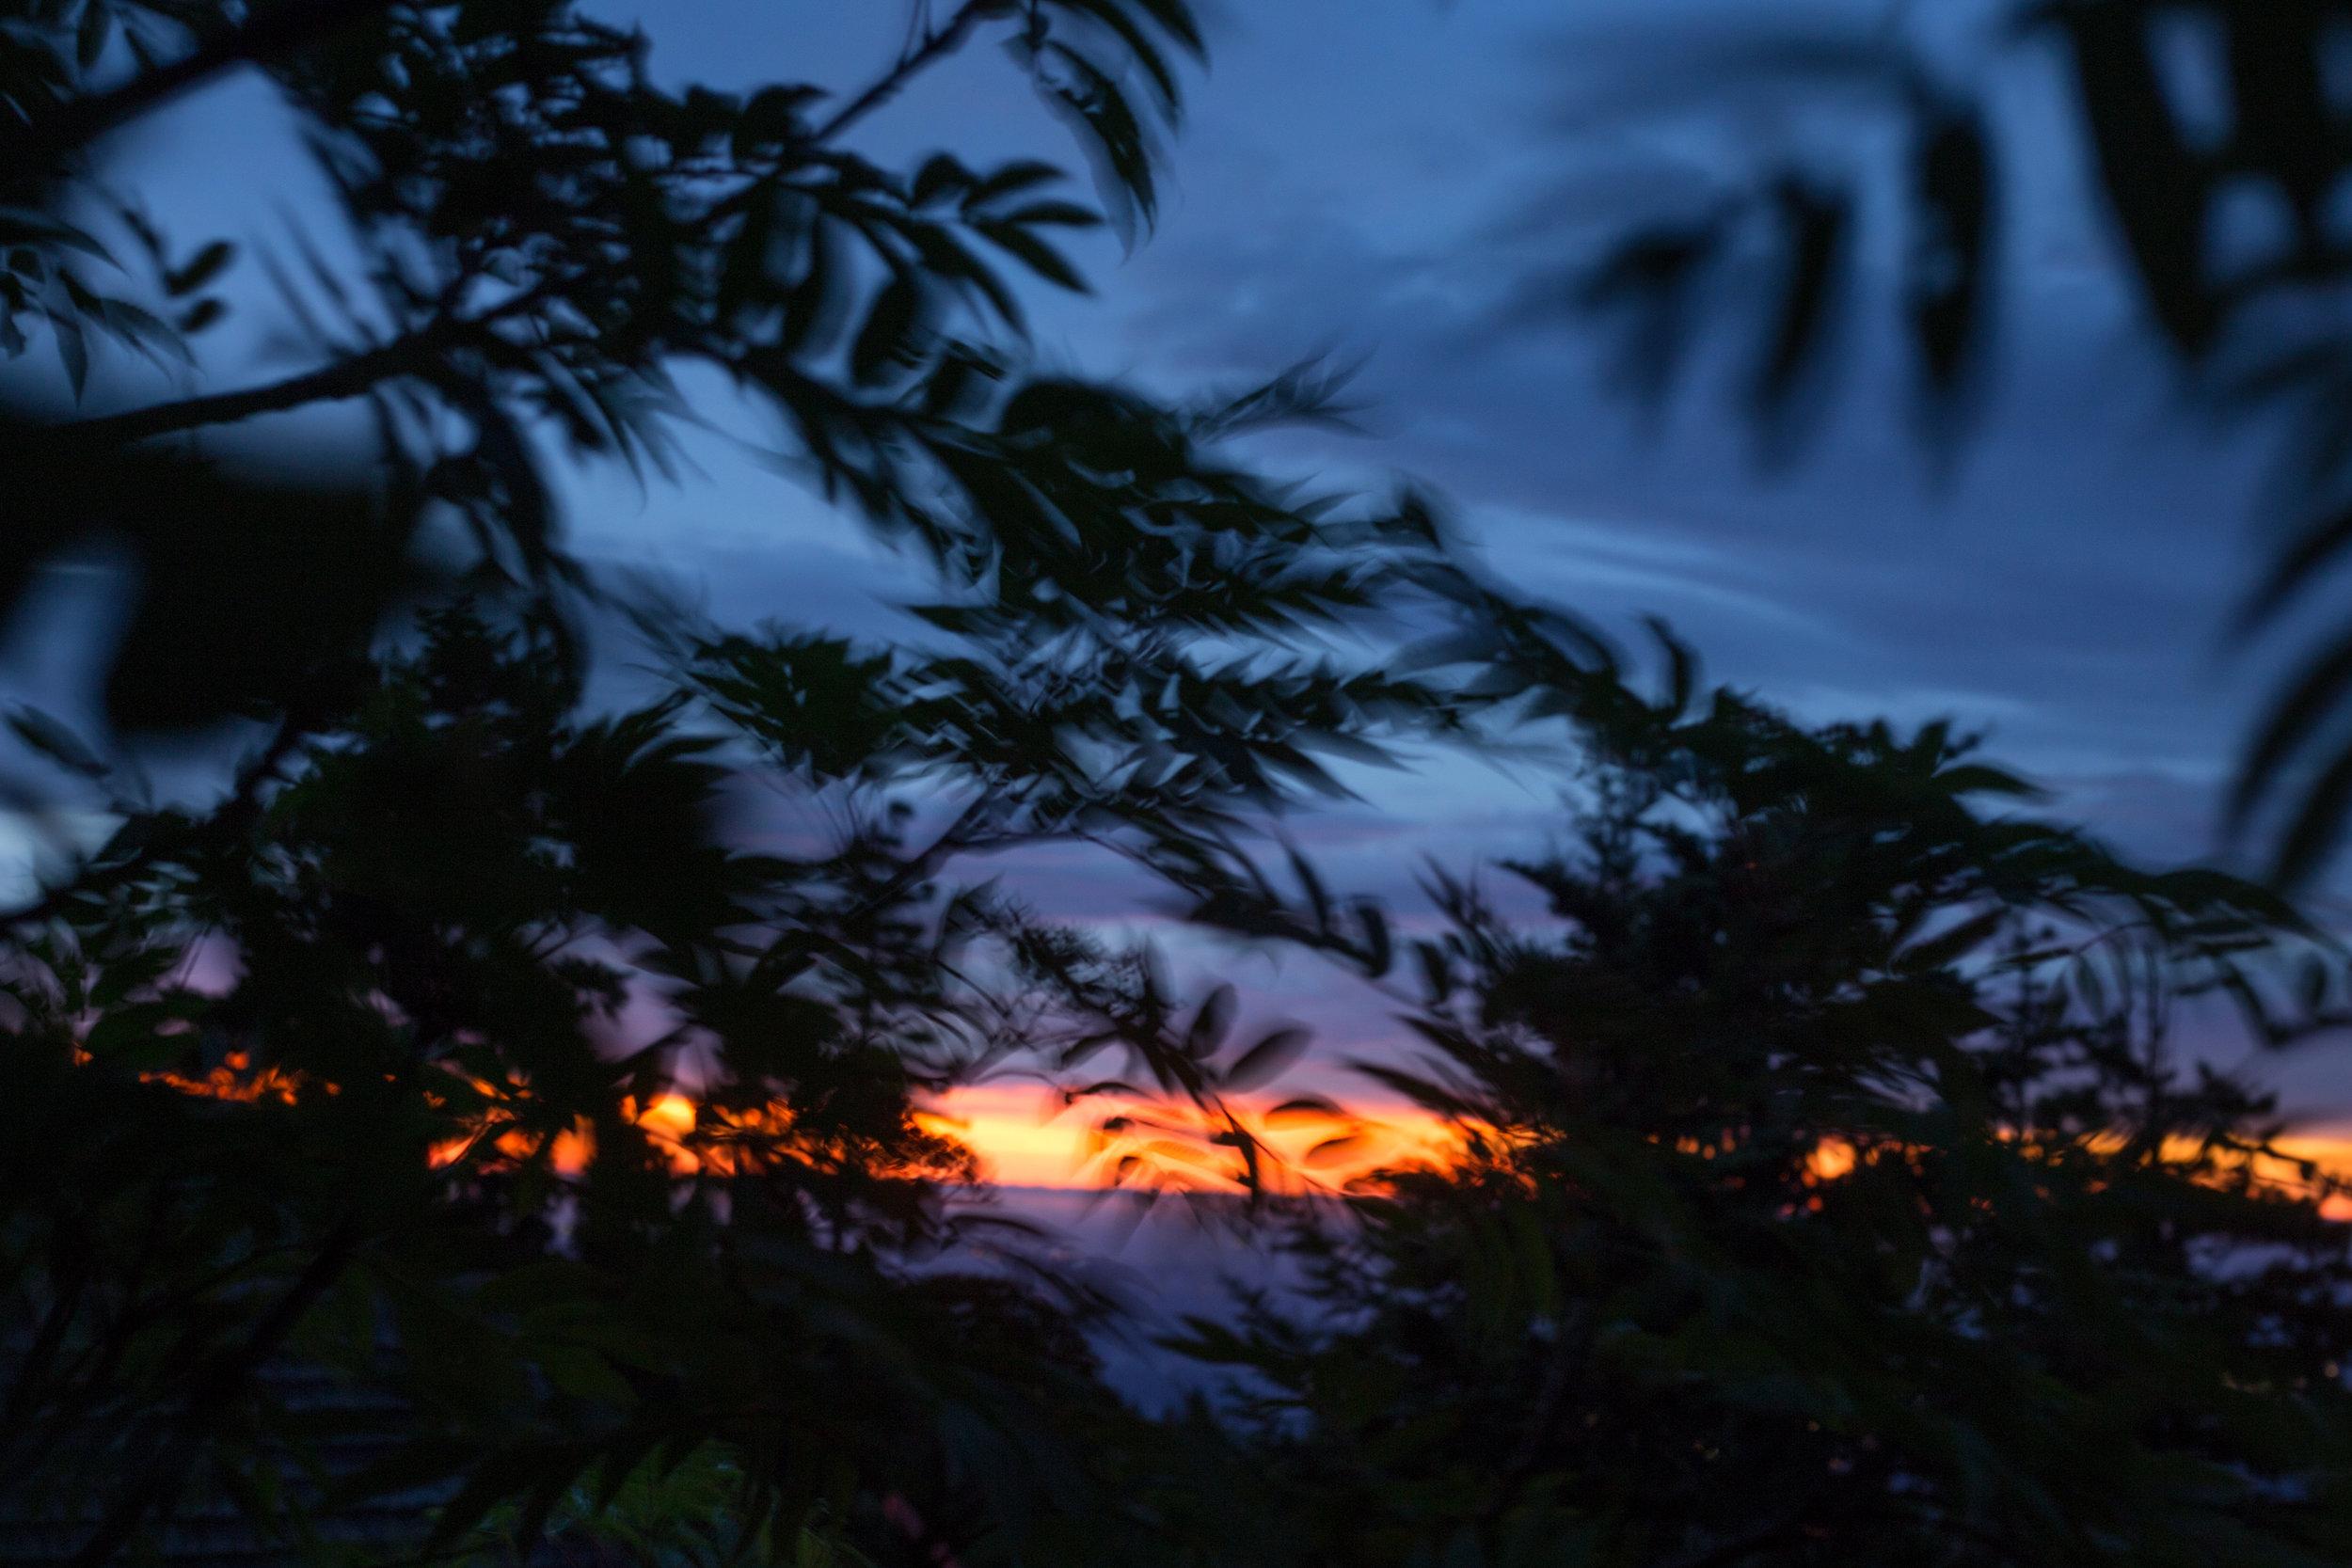 Porch_mtleconte_sunset_web.jpg